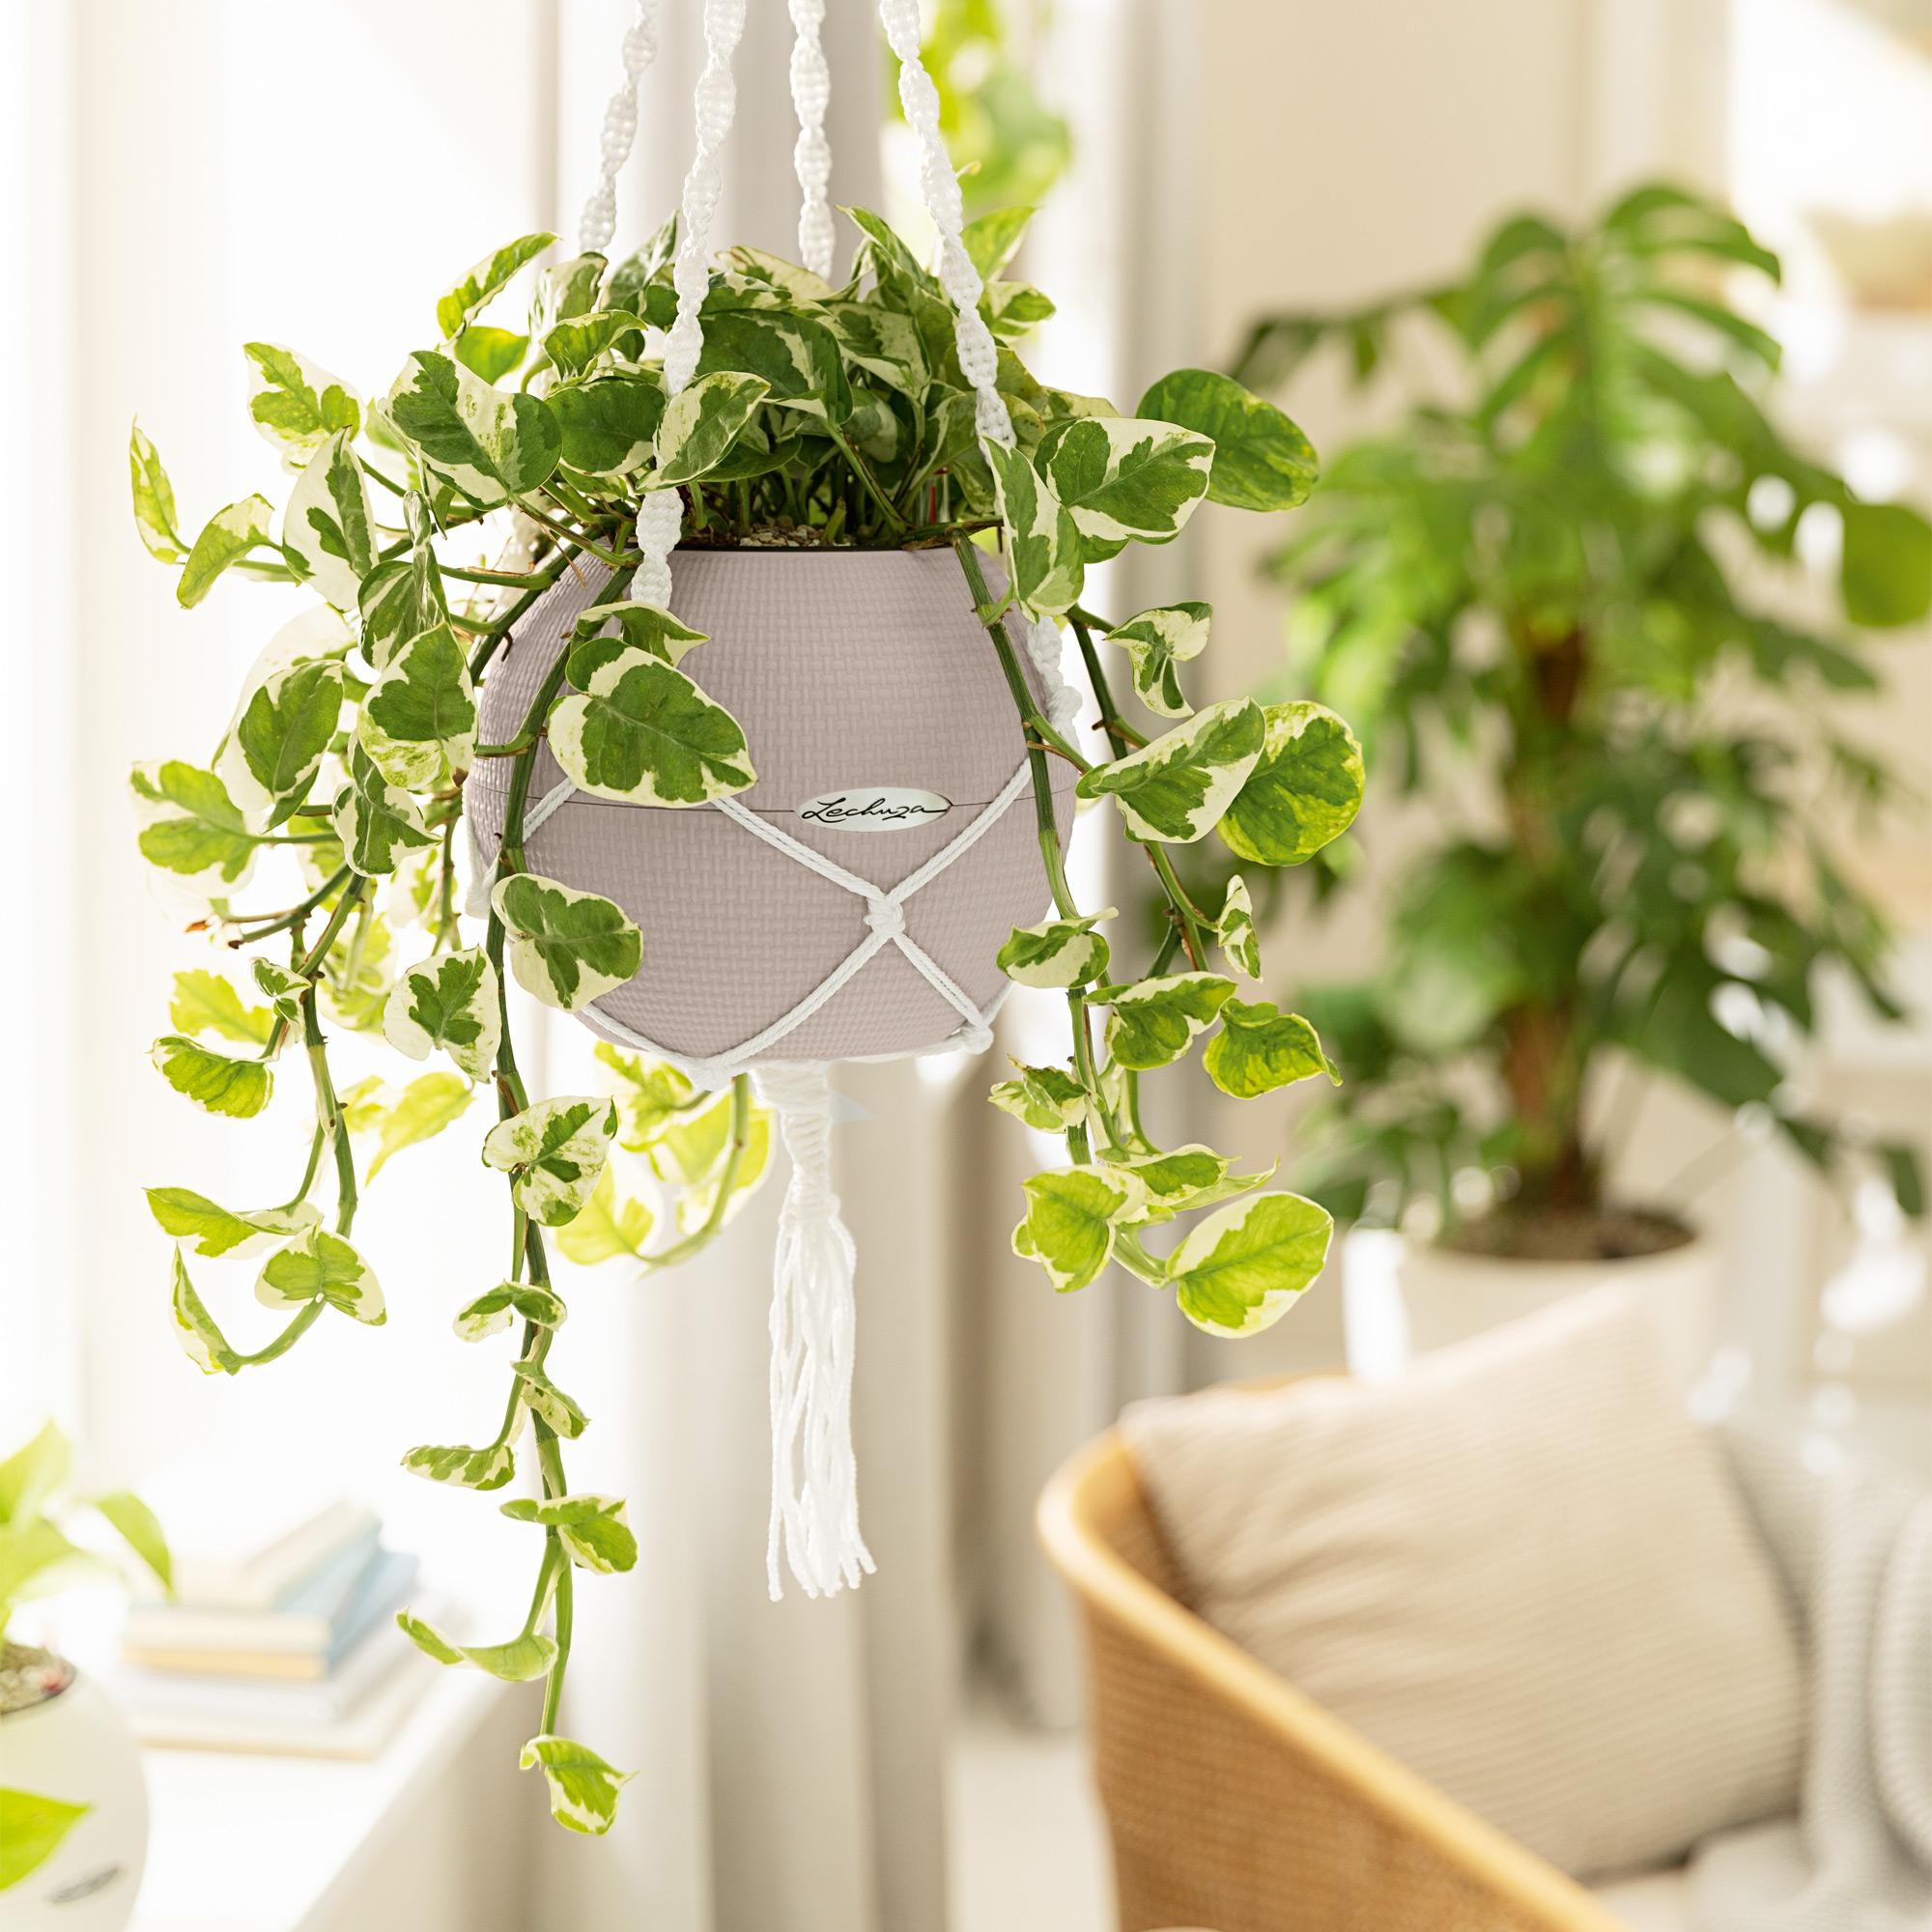 LECHUZA-PURO Color 20 blanc - Image 7